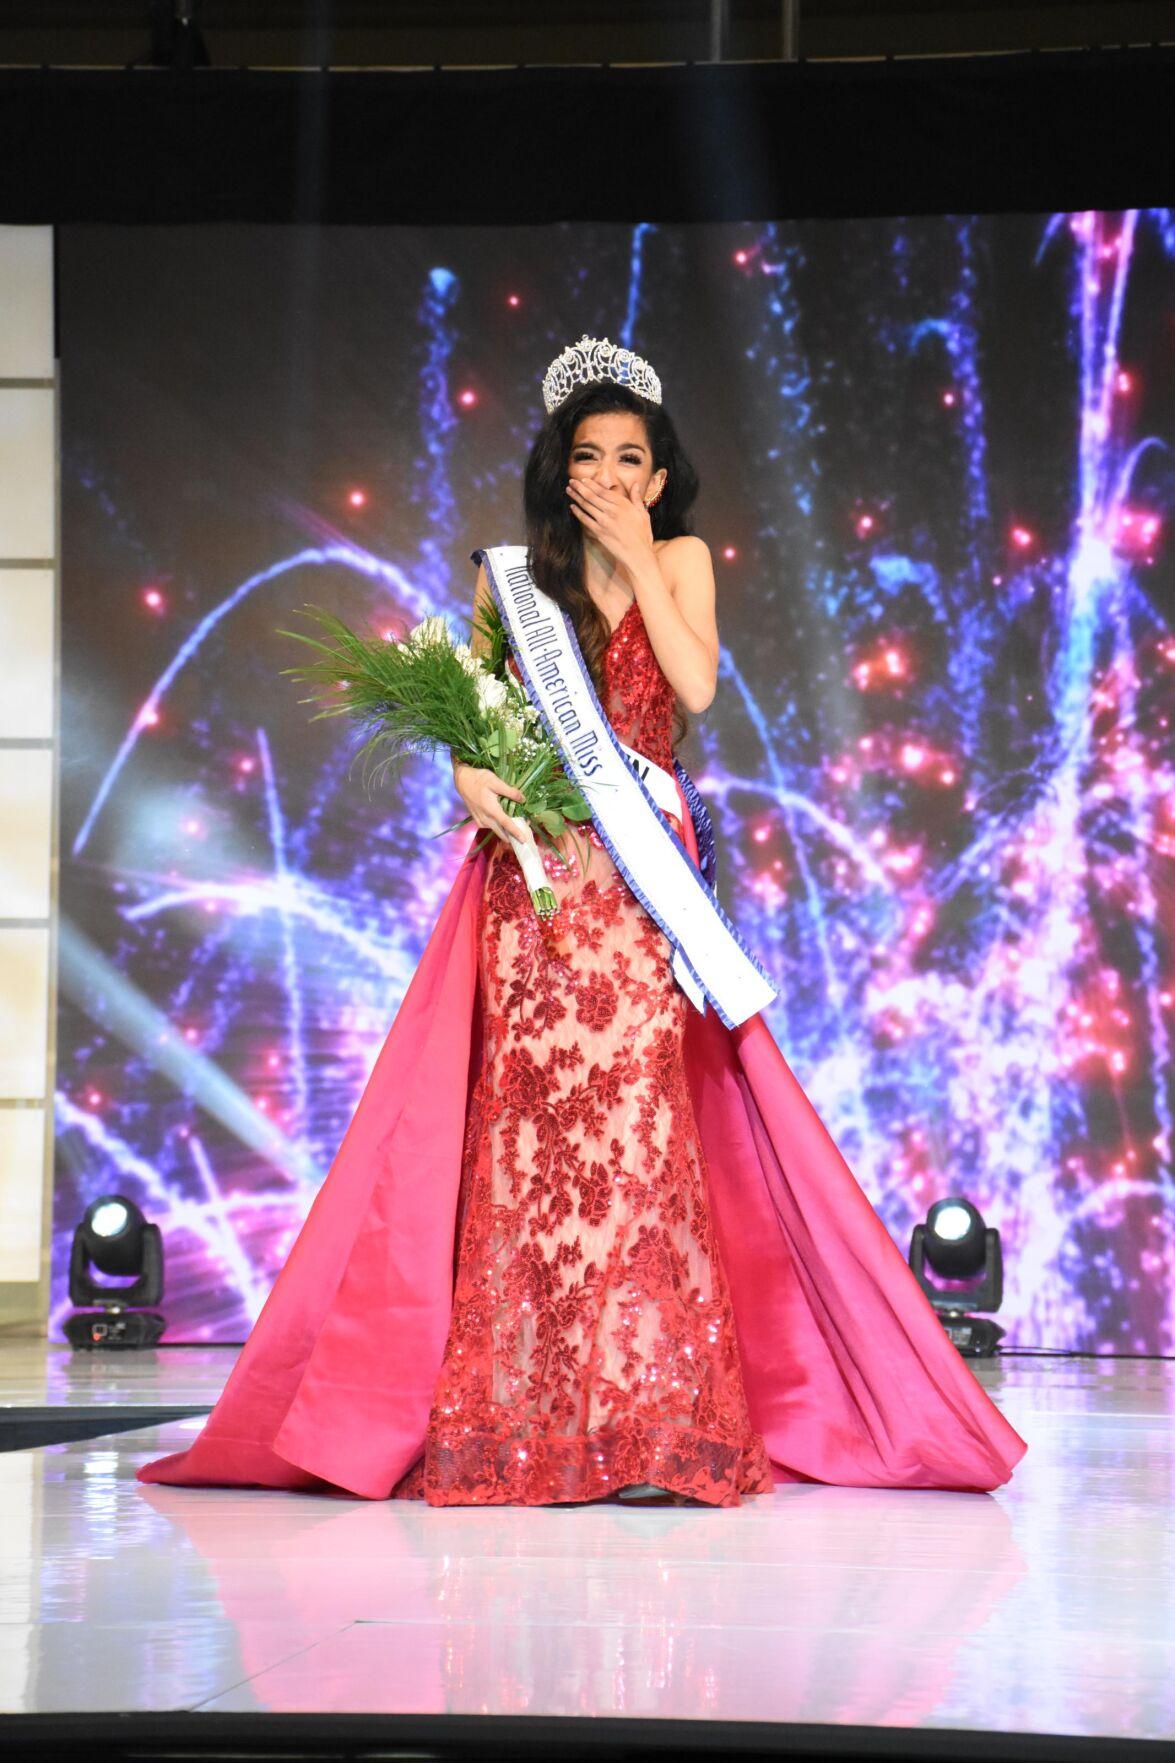 Serene Singh after being crowned National All-American Miss.jpg